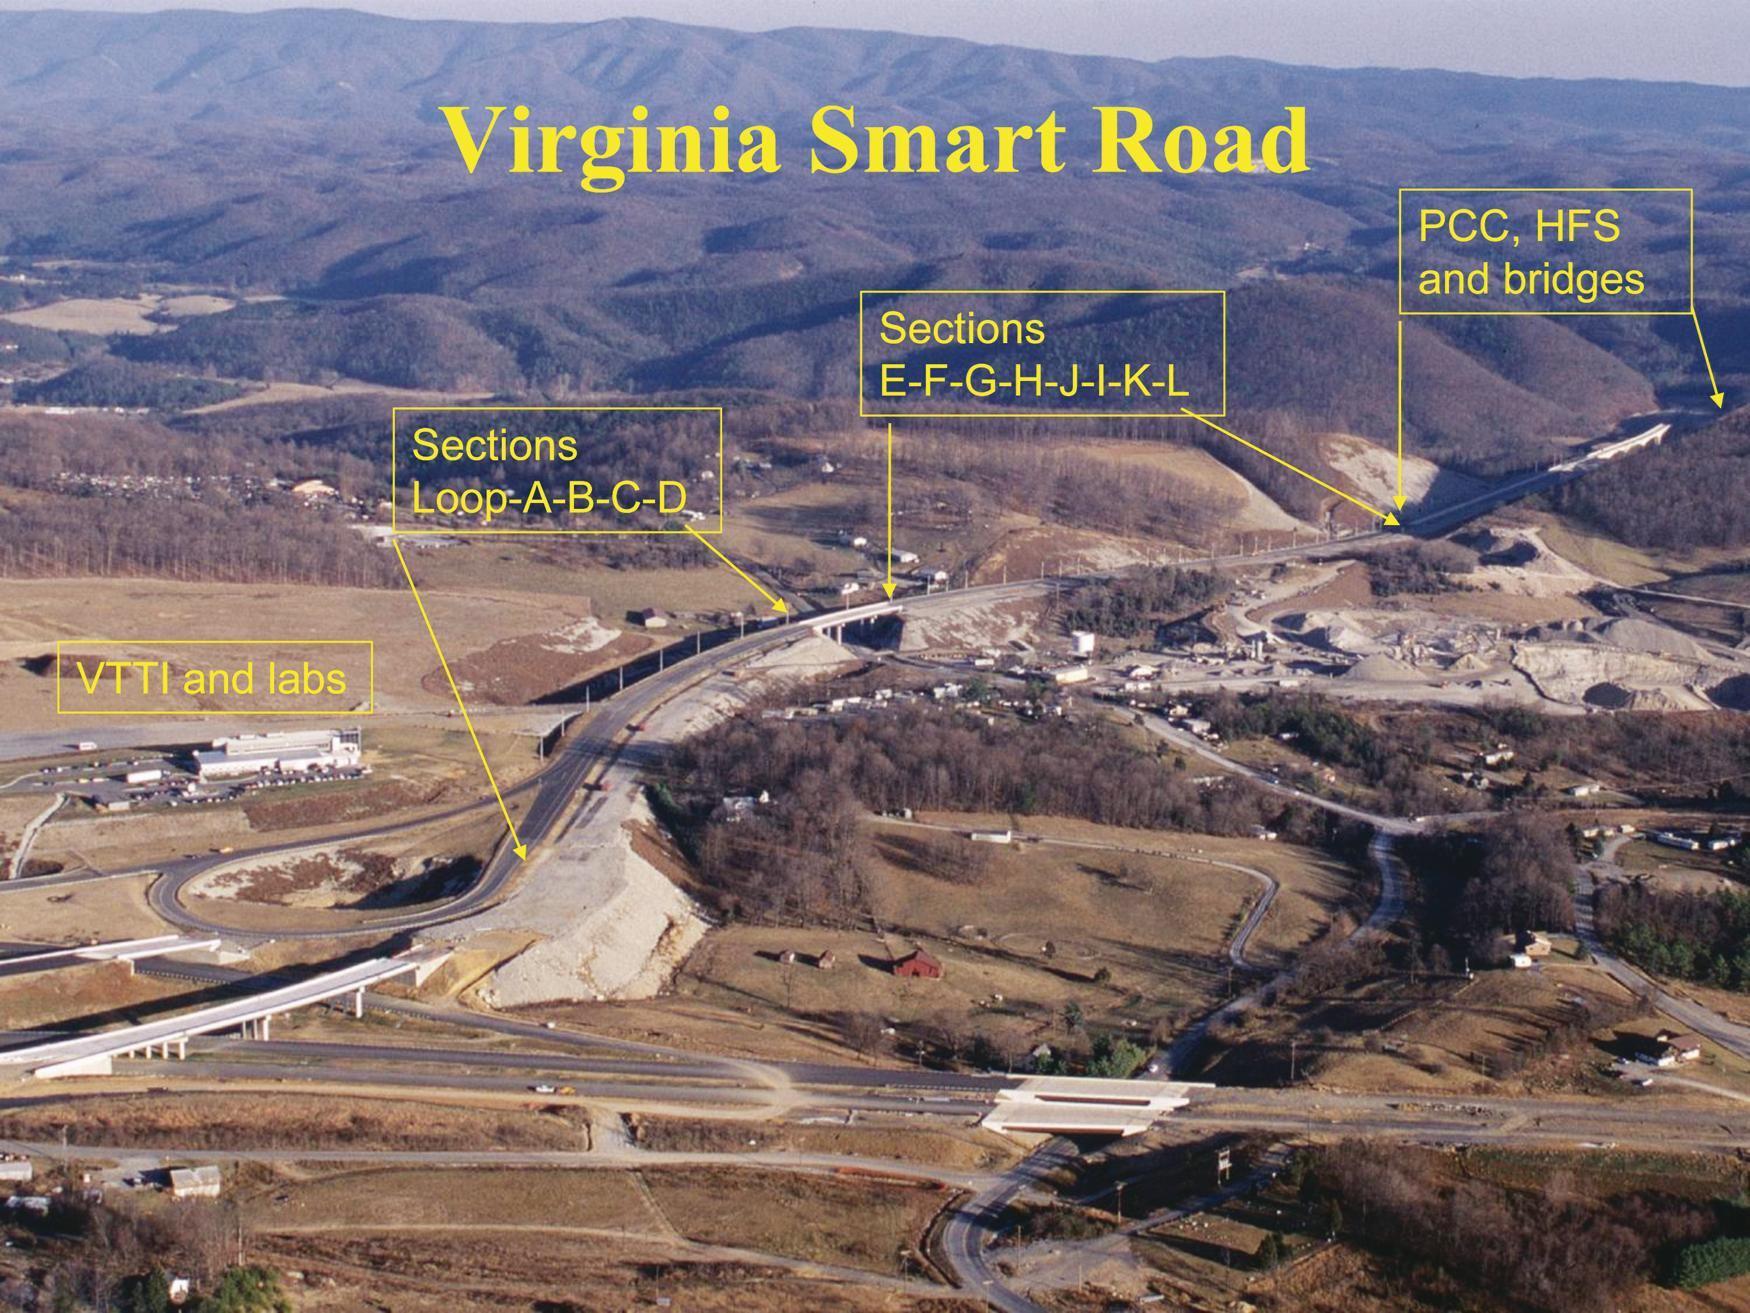 Virginia Smart Road Concrete Construction Magazine